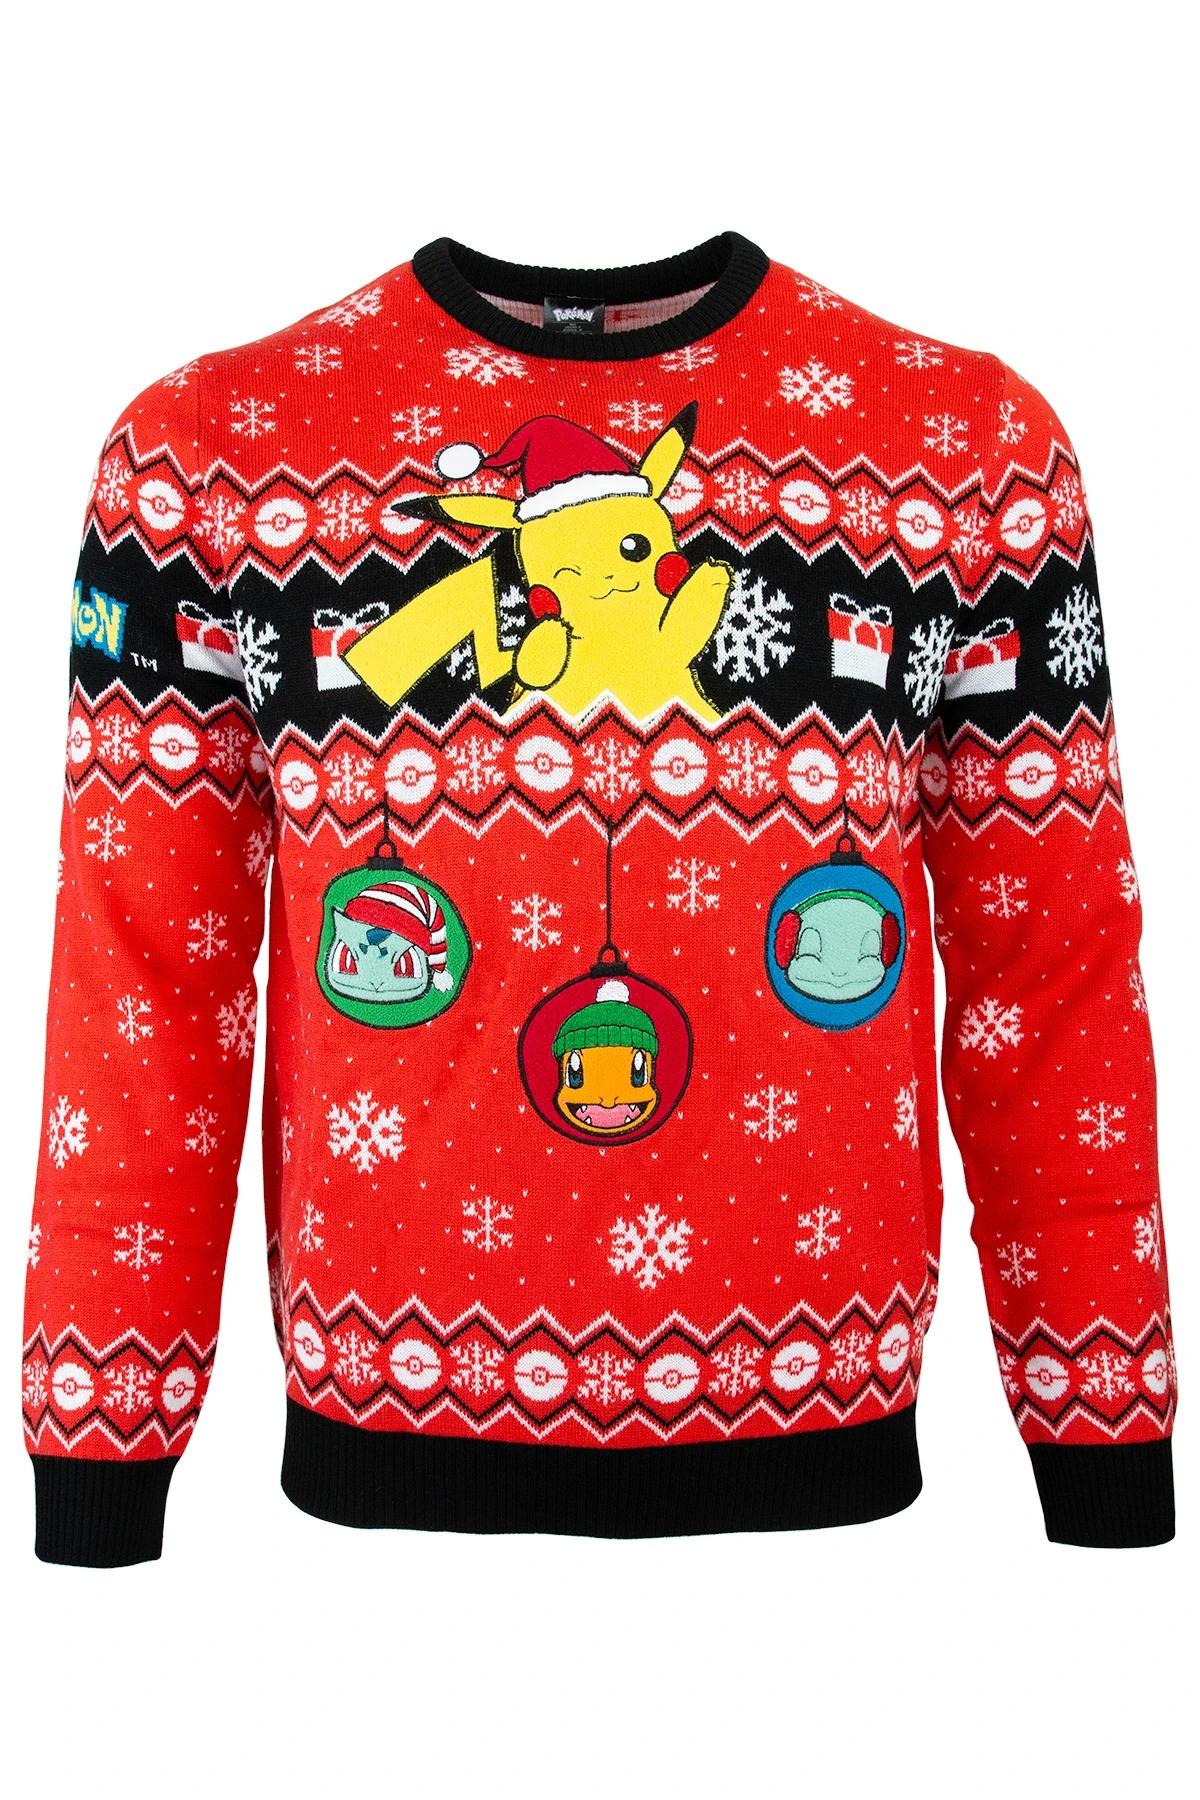 Pikachu Pokémon Ugly Christmas Sweater